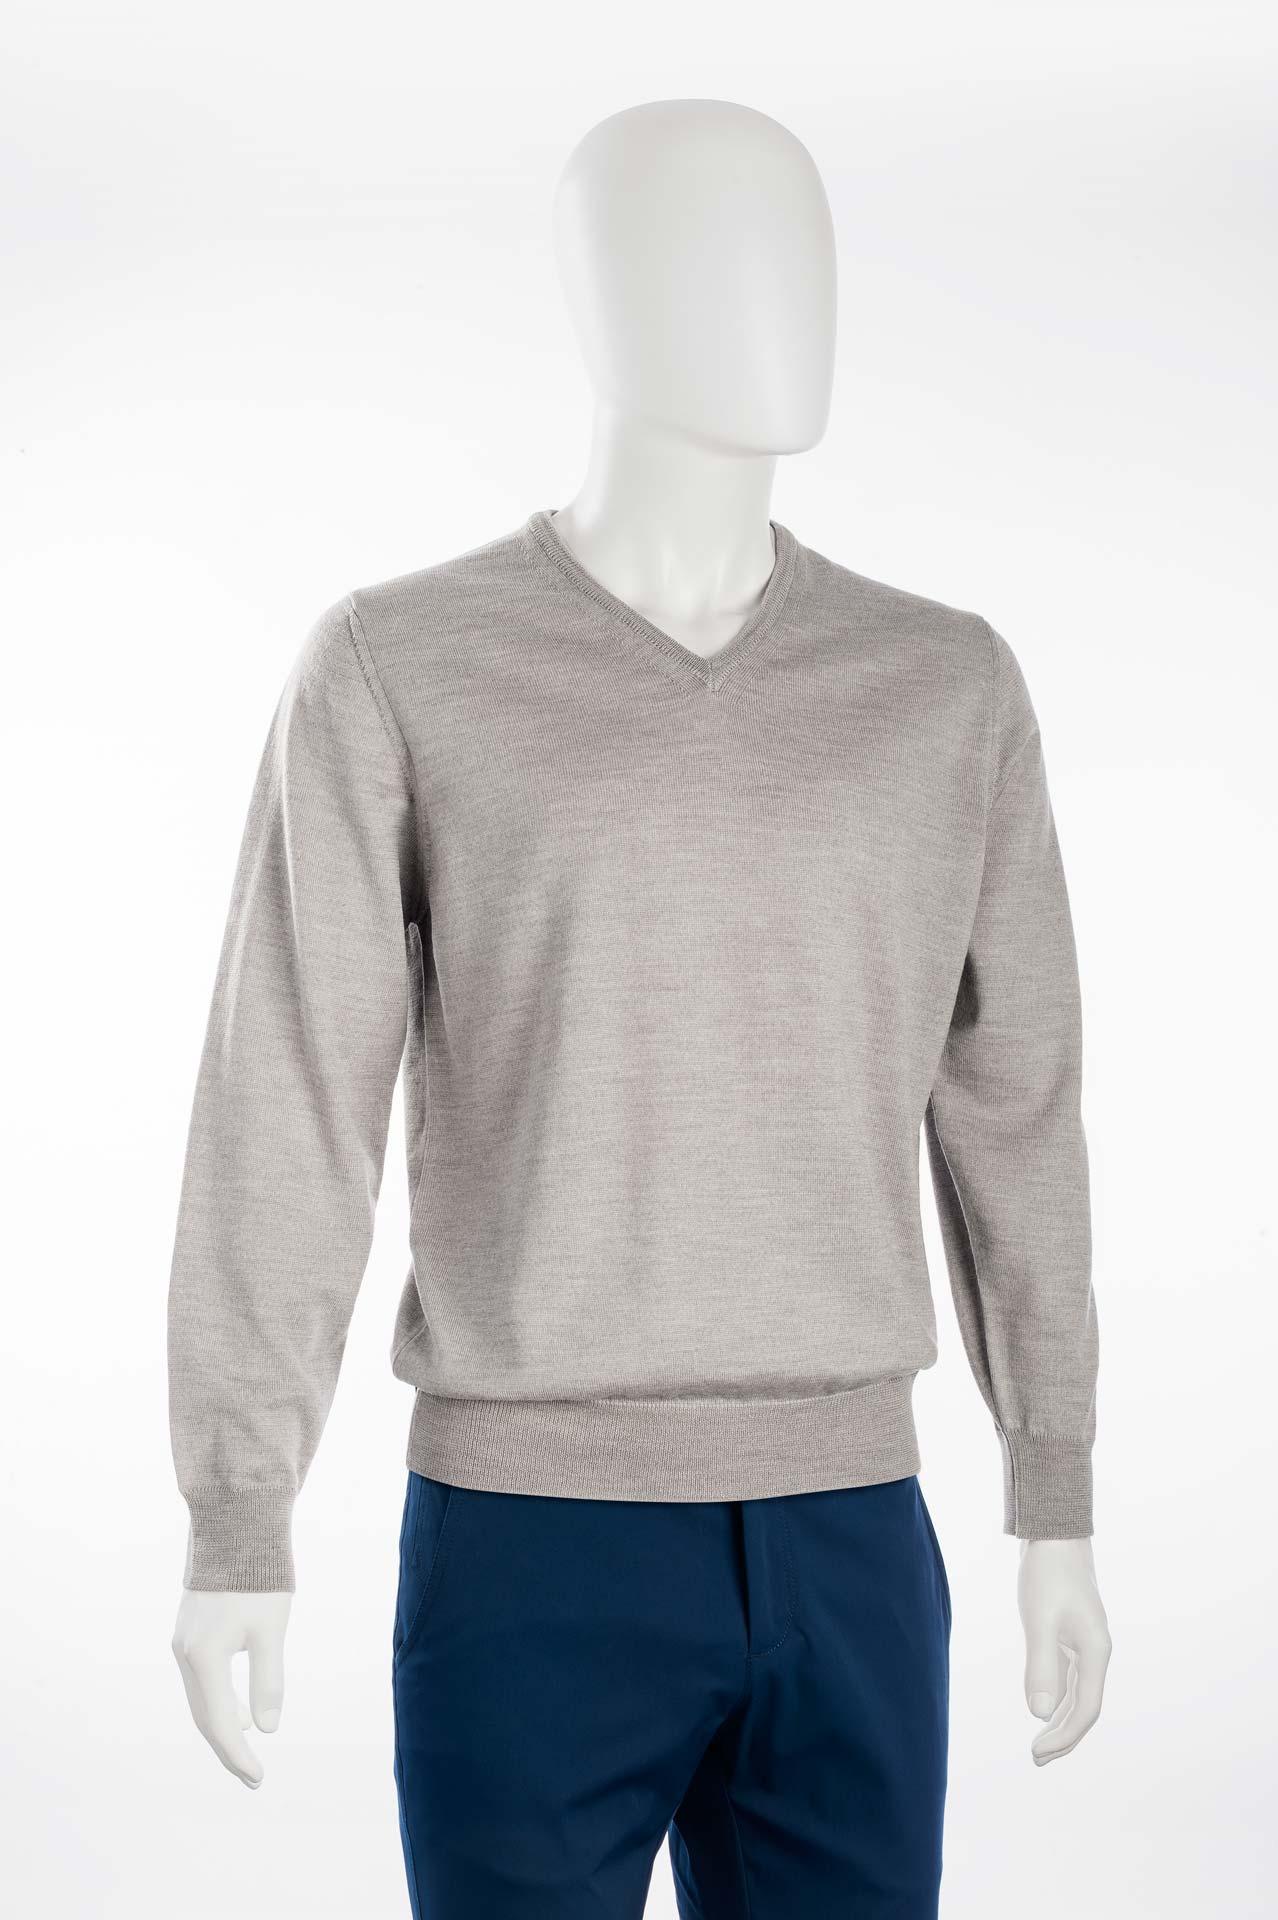 Pullover uomo manica lungaART.1500 colore 2741